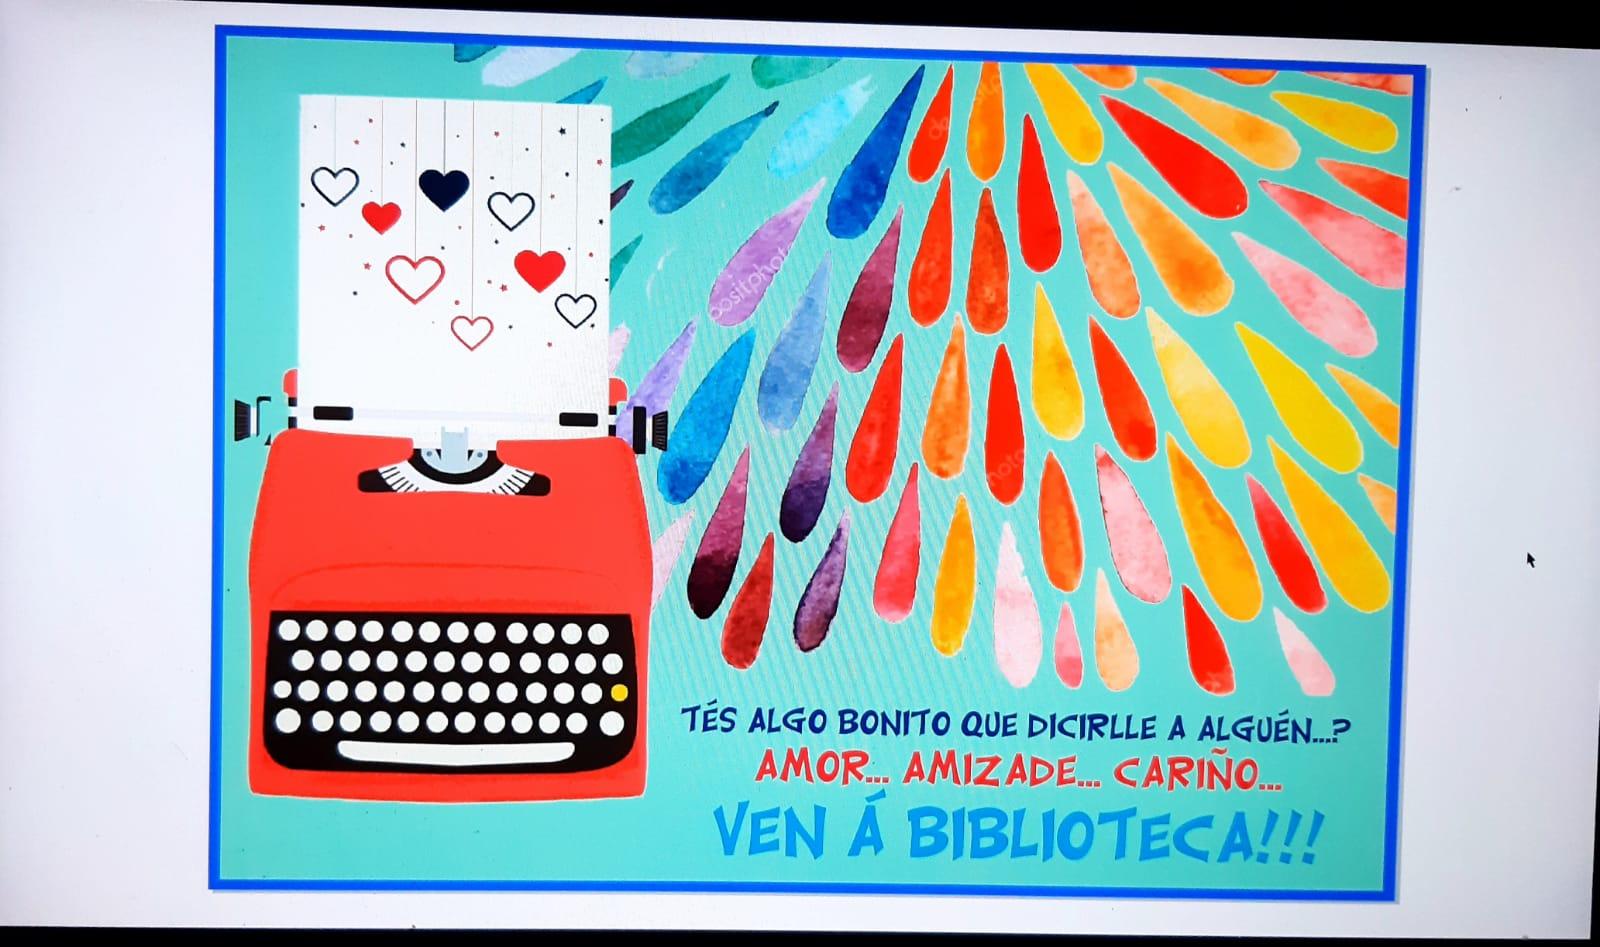 Cartel da biblioteca